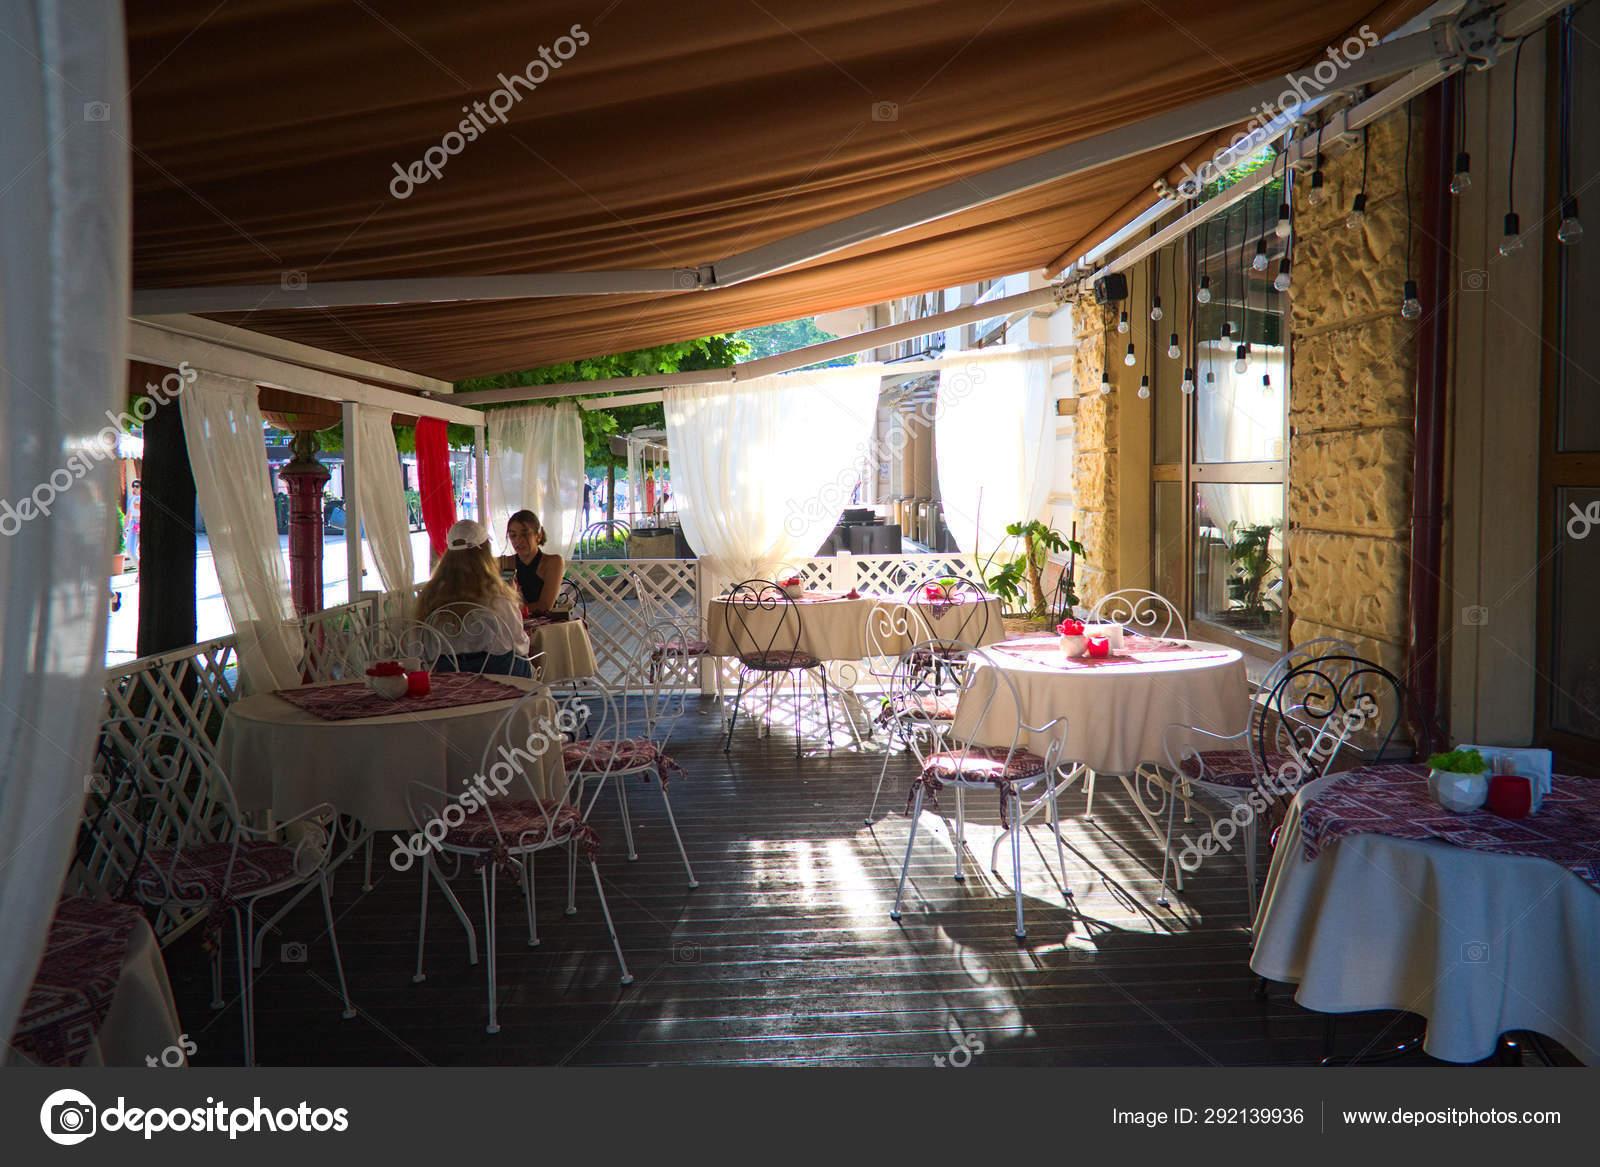 Ivano Frankivs Ukraine June 2019 People Have Dinner Terrace Restaurant Stock Editorial Photo C Vitaliikaras 292139936